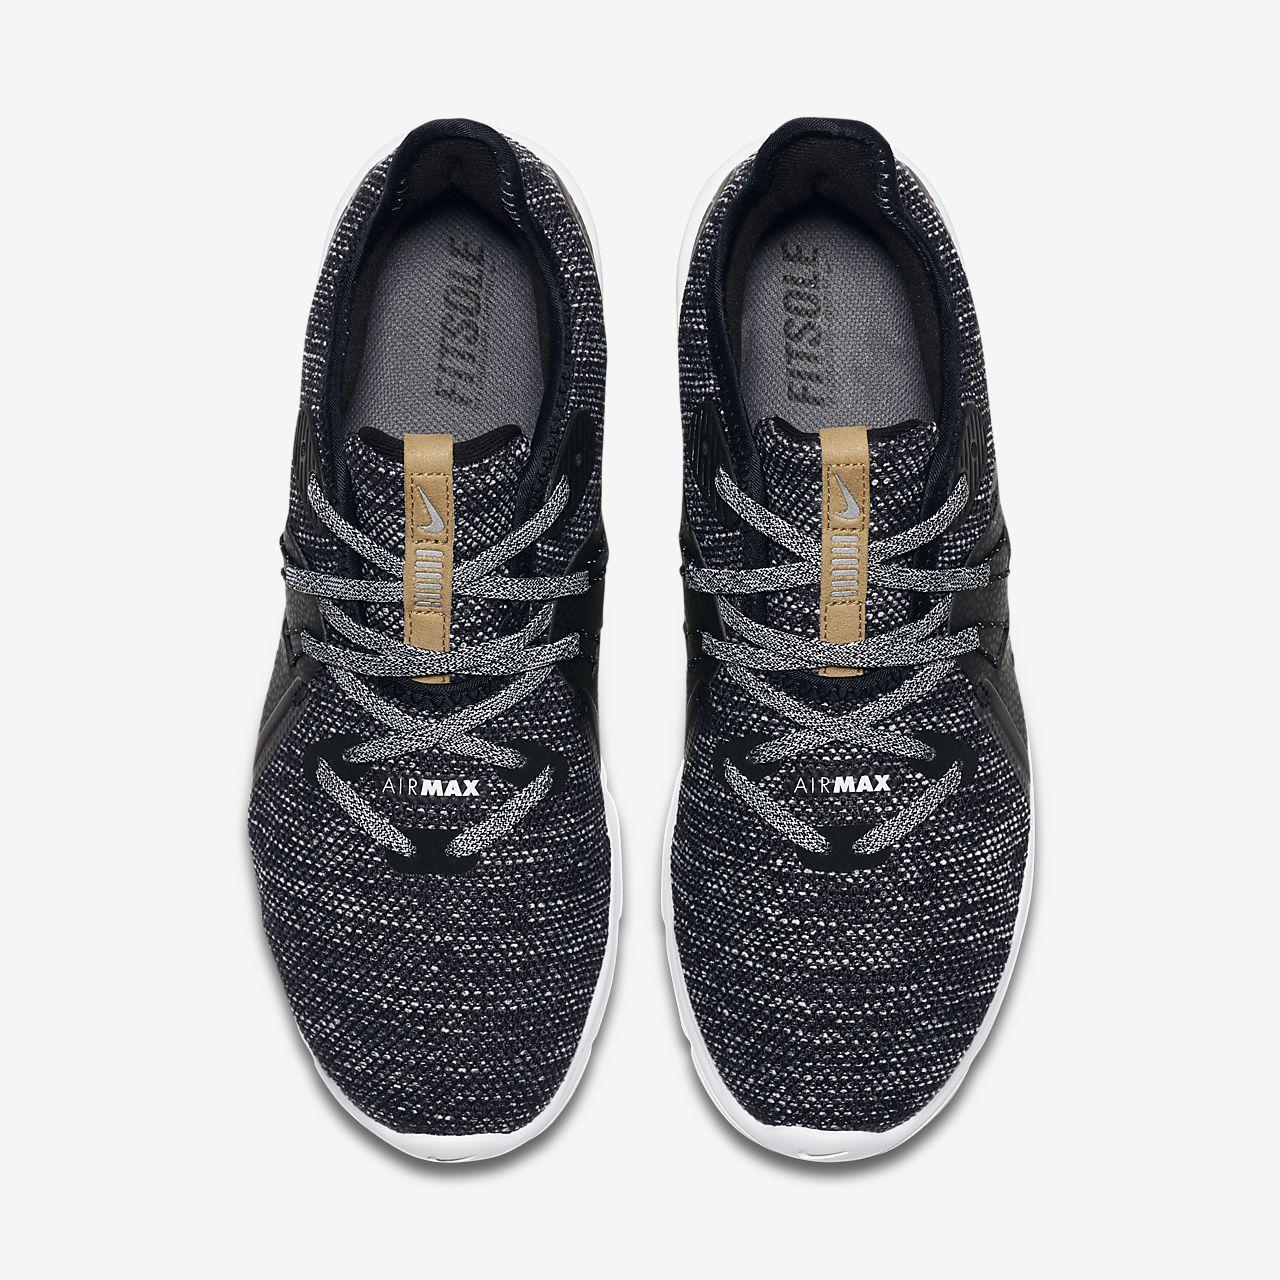 5e584050b Dámská bota Nike Air Max Sequent 3. Nike.com CZ